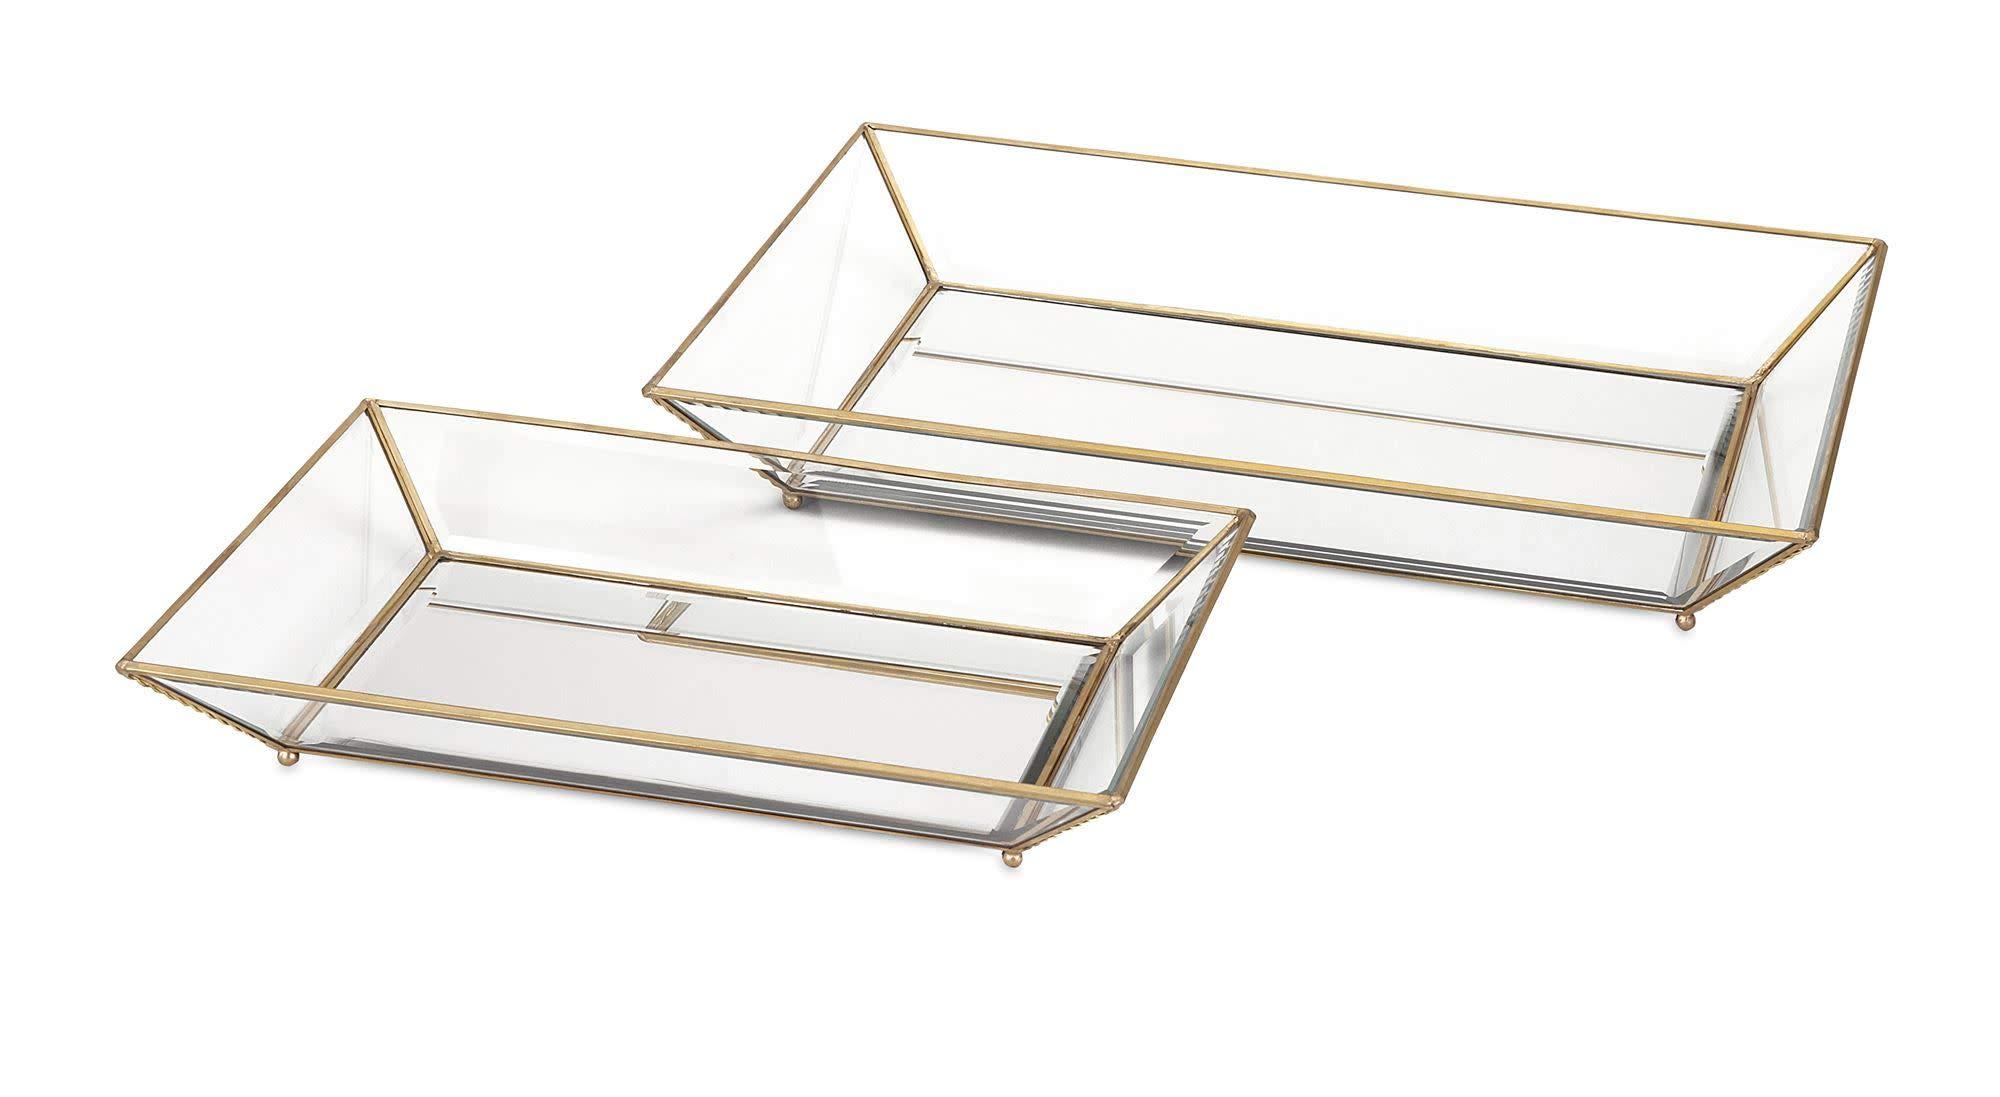 IMAX 31511-2 Maison Decorative Glass Trays (Set of 2)